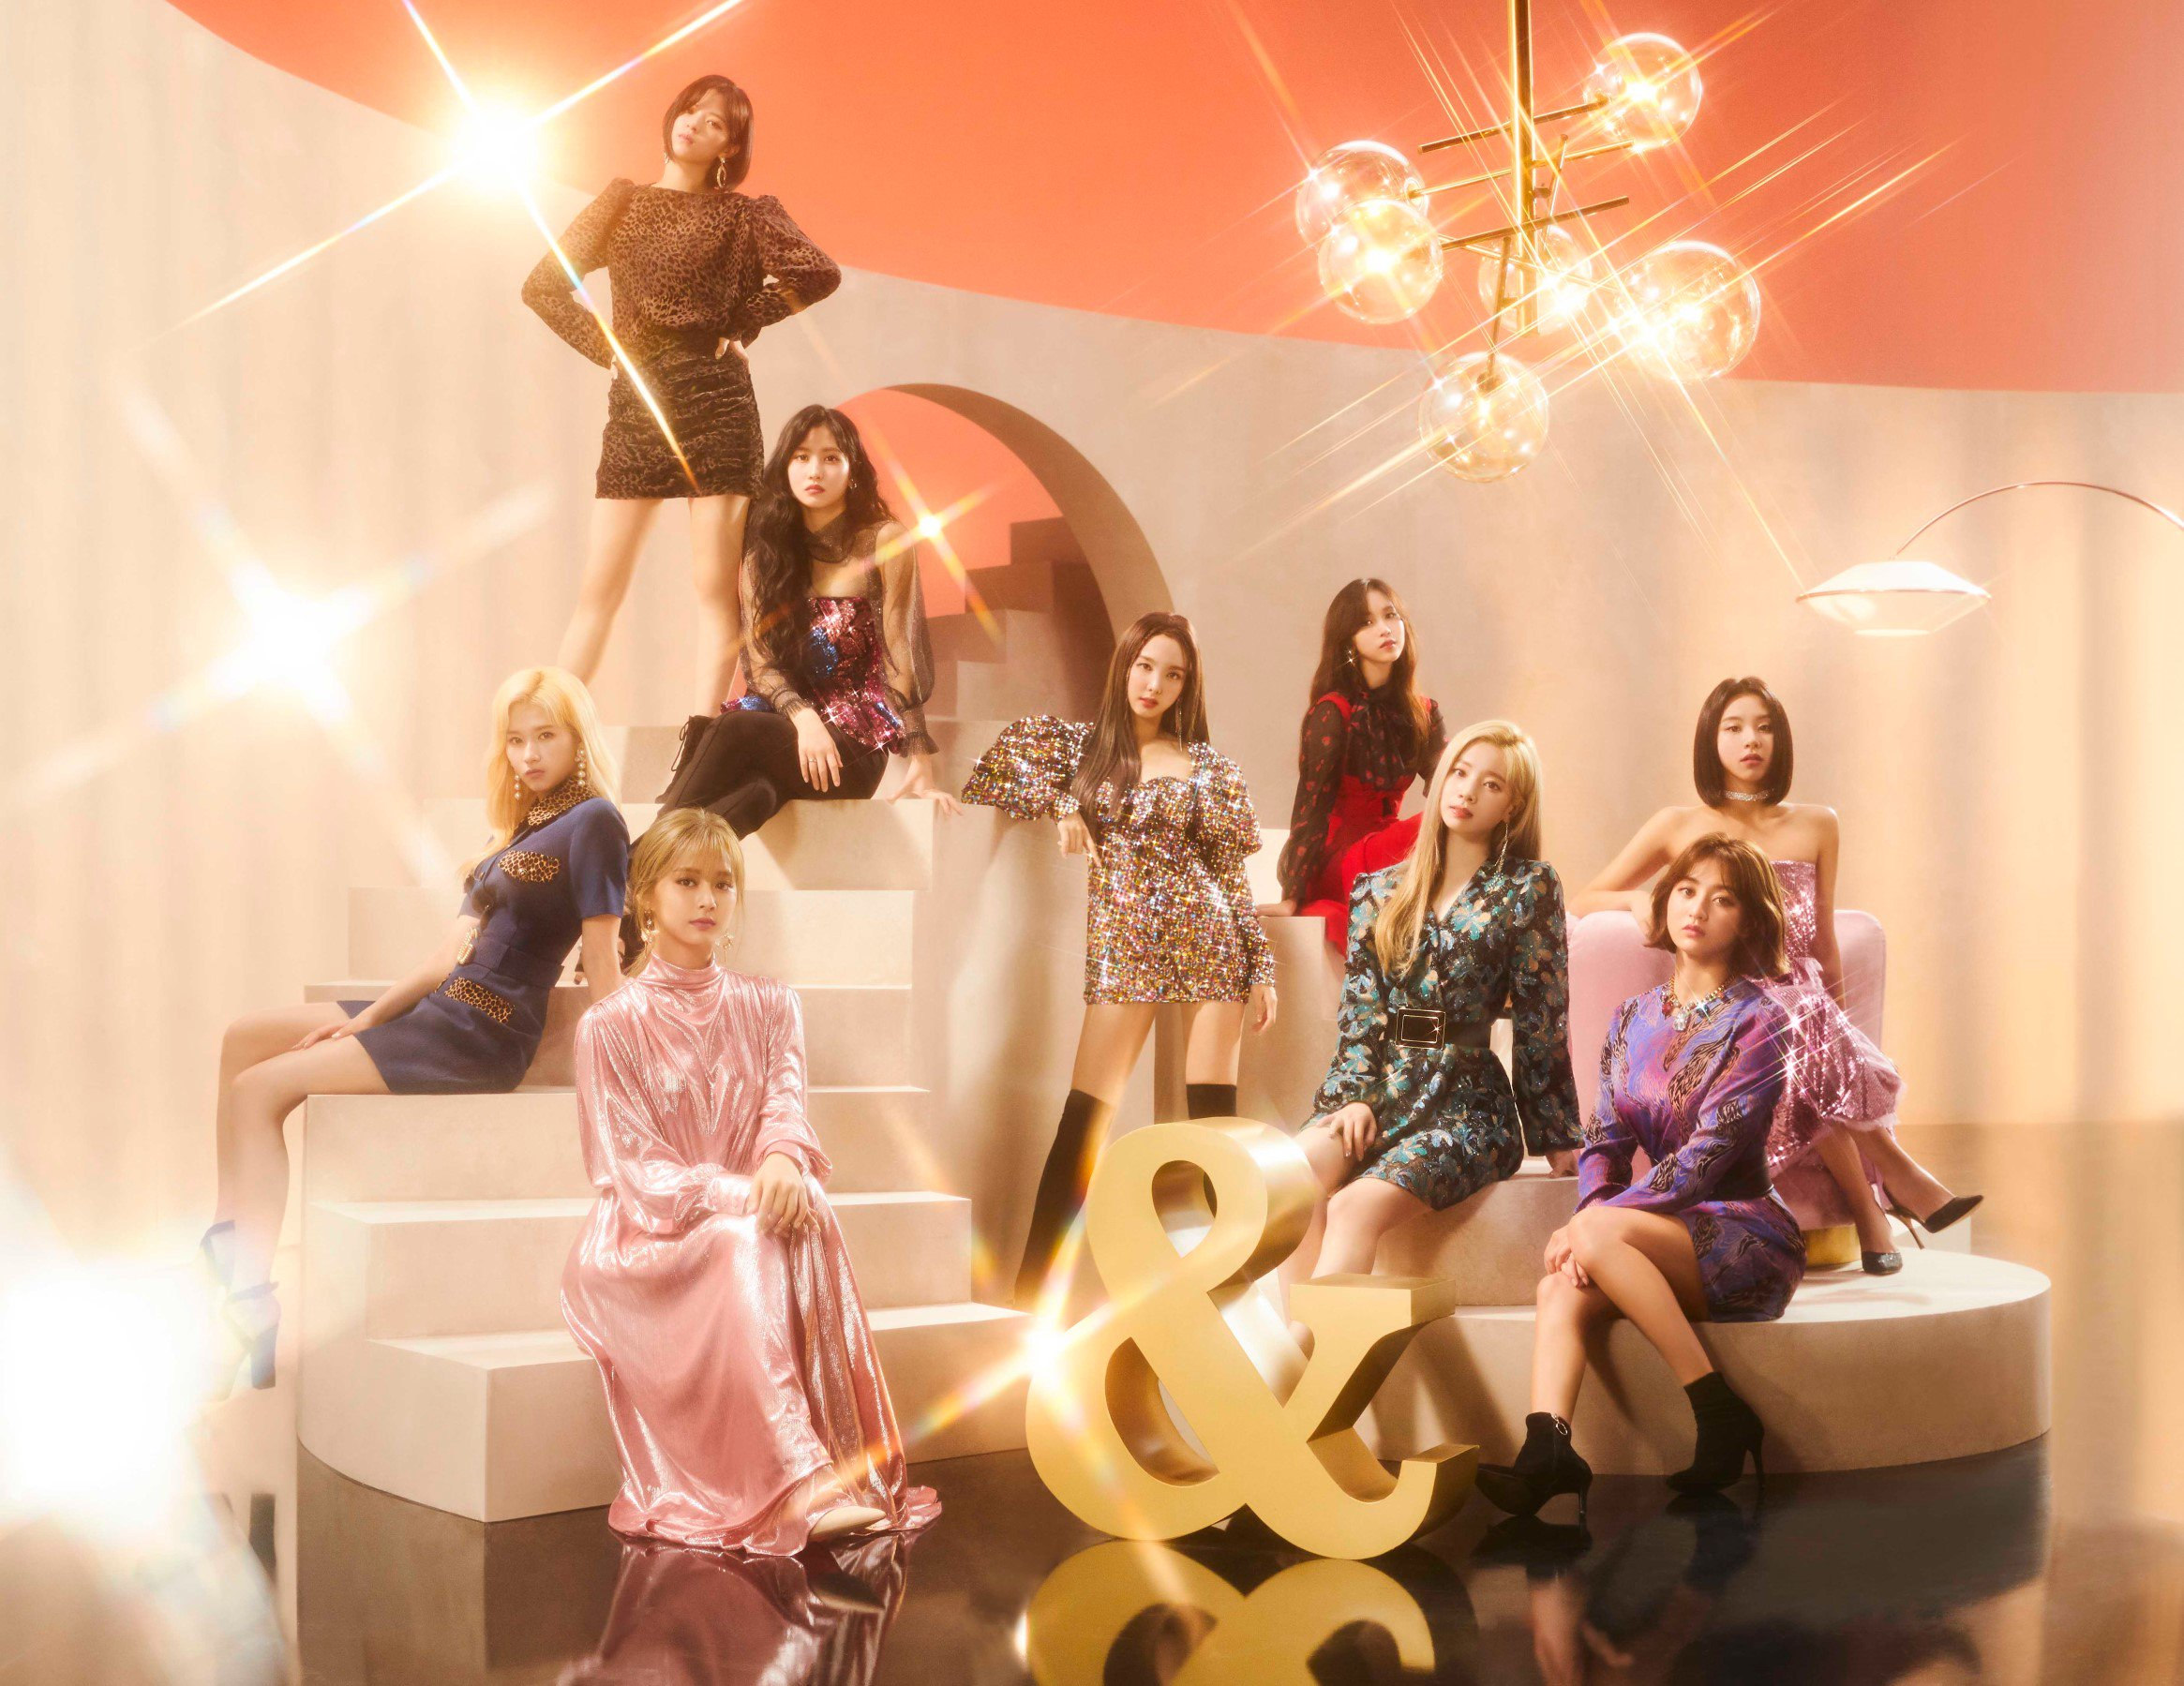 TWICE &TWICE Concept Photos (Nayeon, Jeongyeon, Momo, Sana, Jihyo) HD/HR